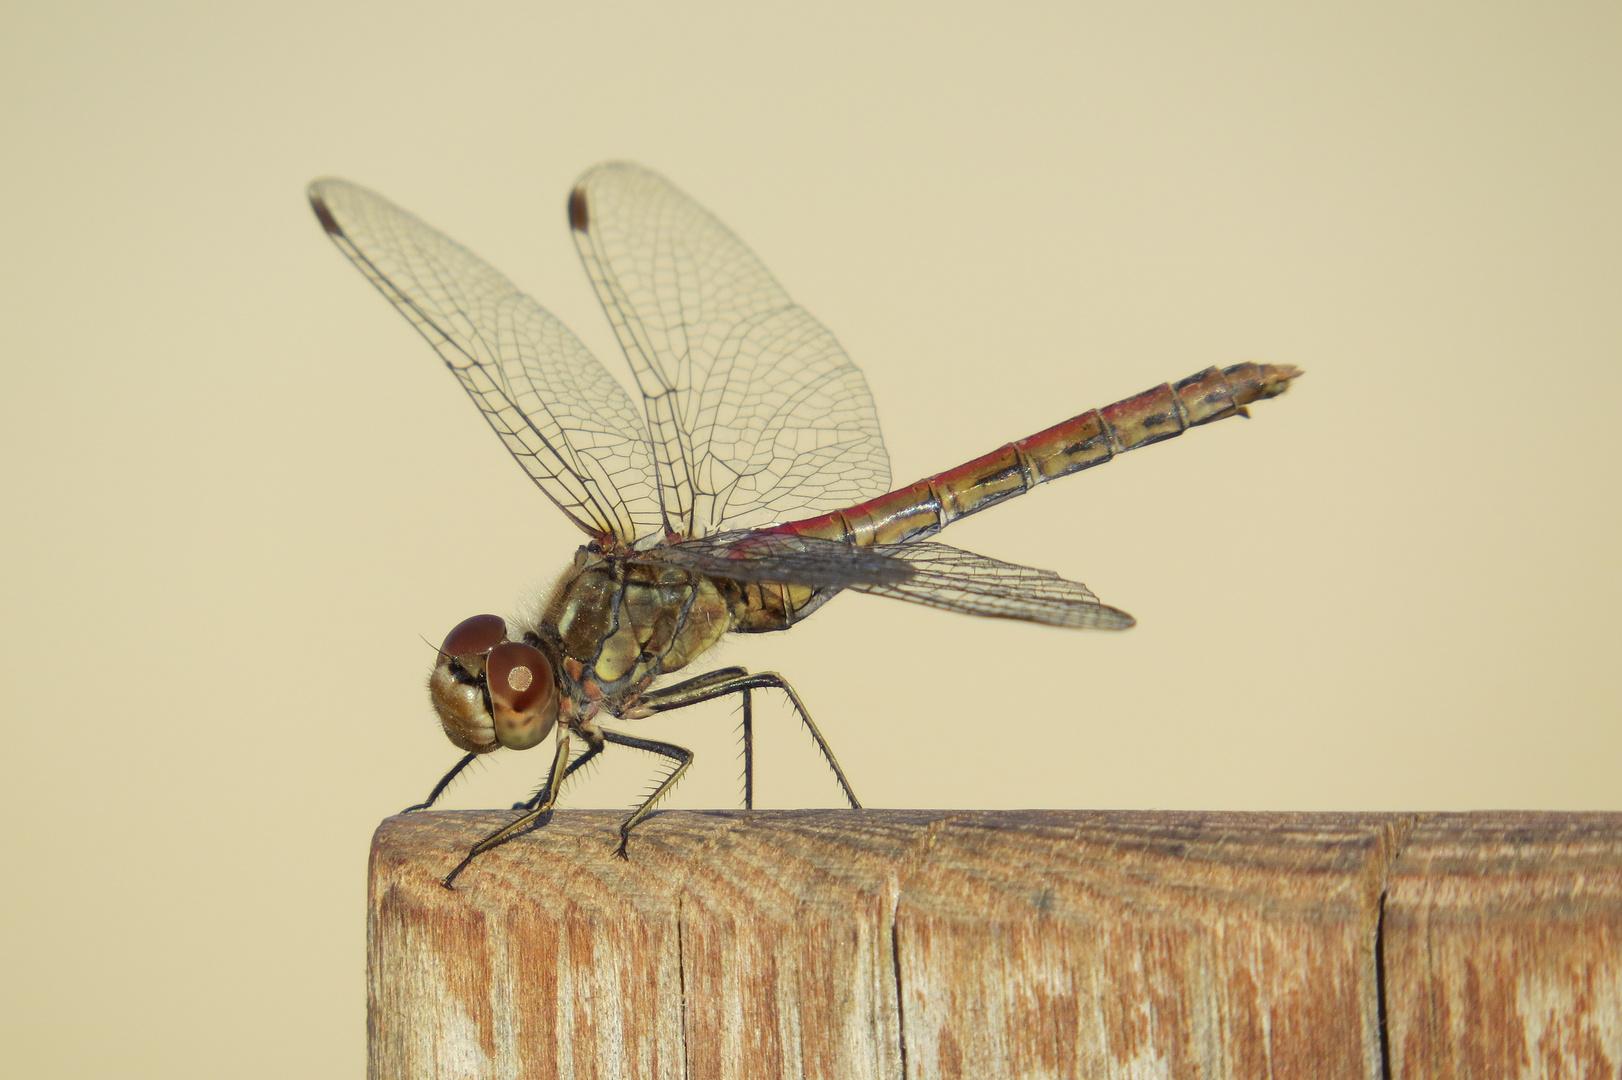 Braune Libelle